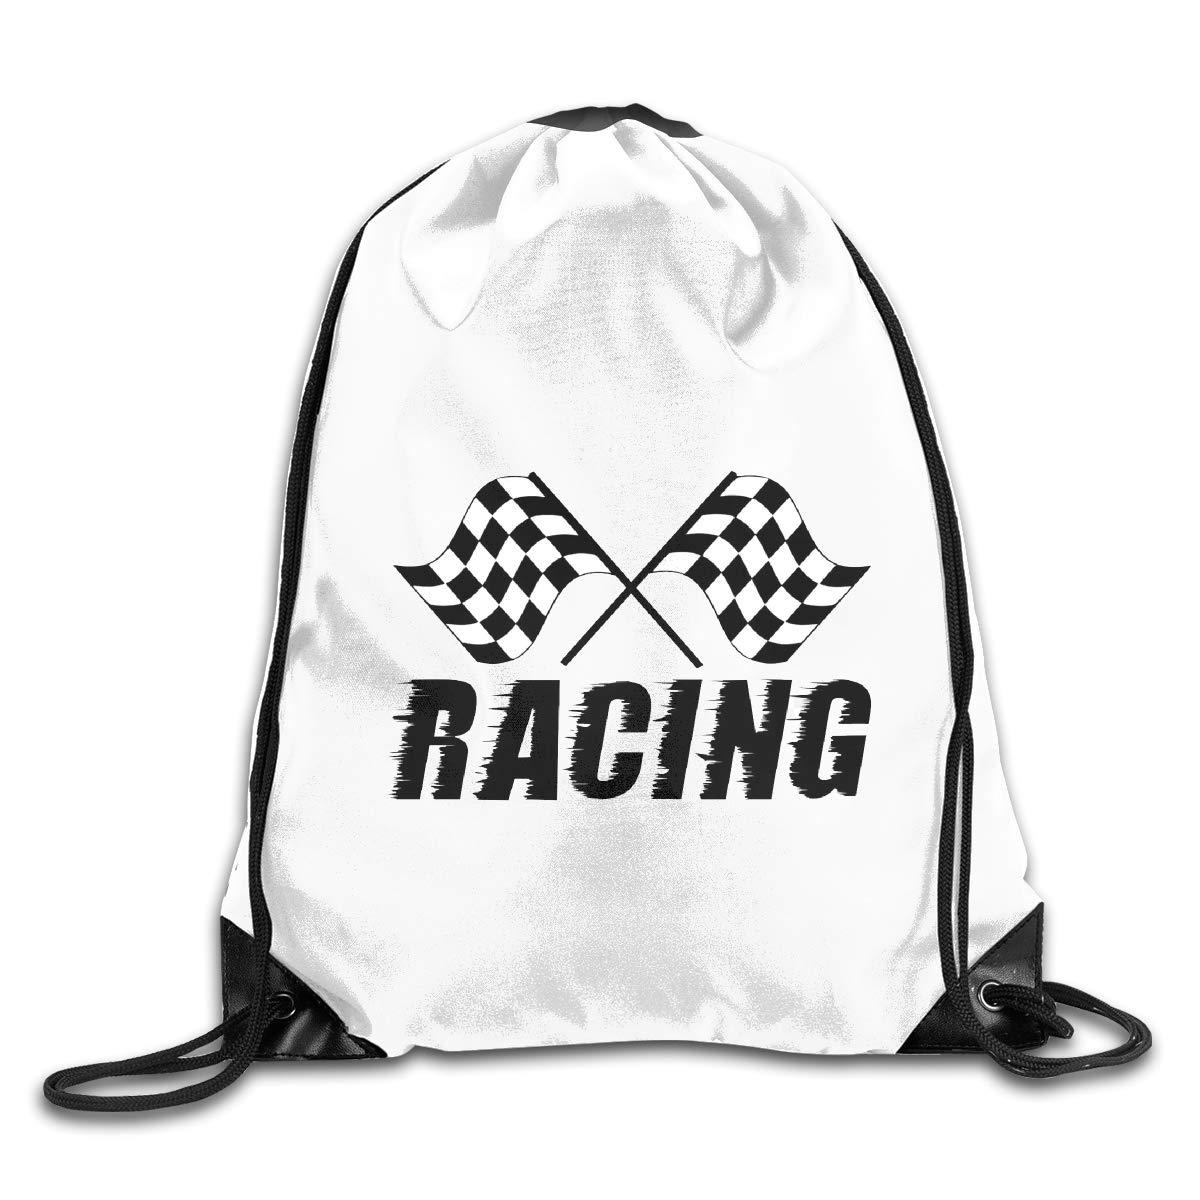 Racing Flags Check Clip Art Drawstring Bags Eat Sleep Dance Repeat Beam Mouth Backpack Basketball Tennis Gympack